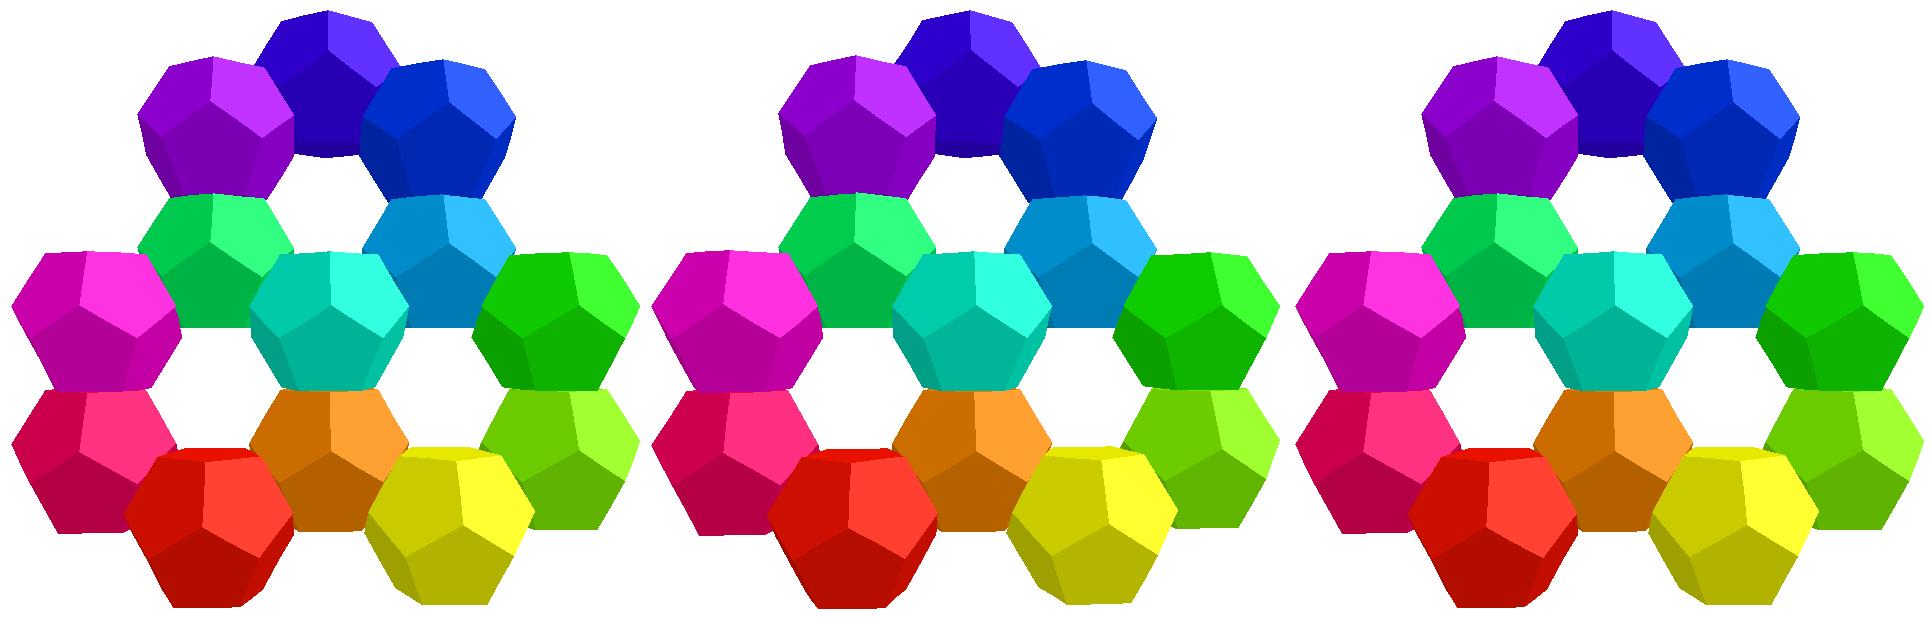 610_dodecahedron_uspHxgPck_D302.png